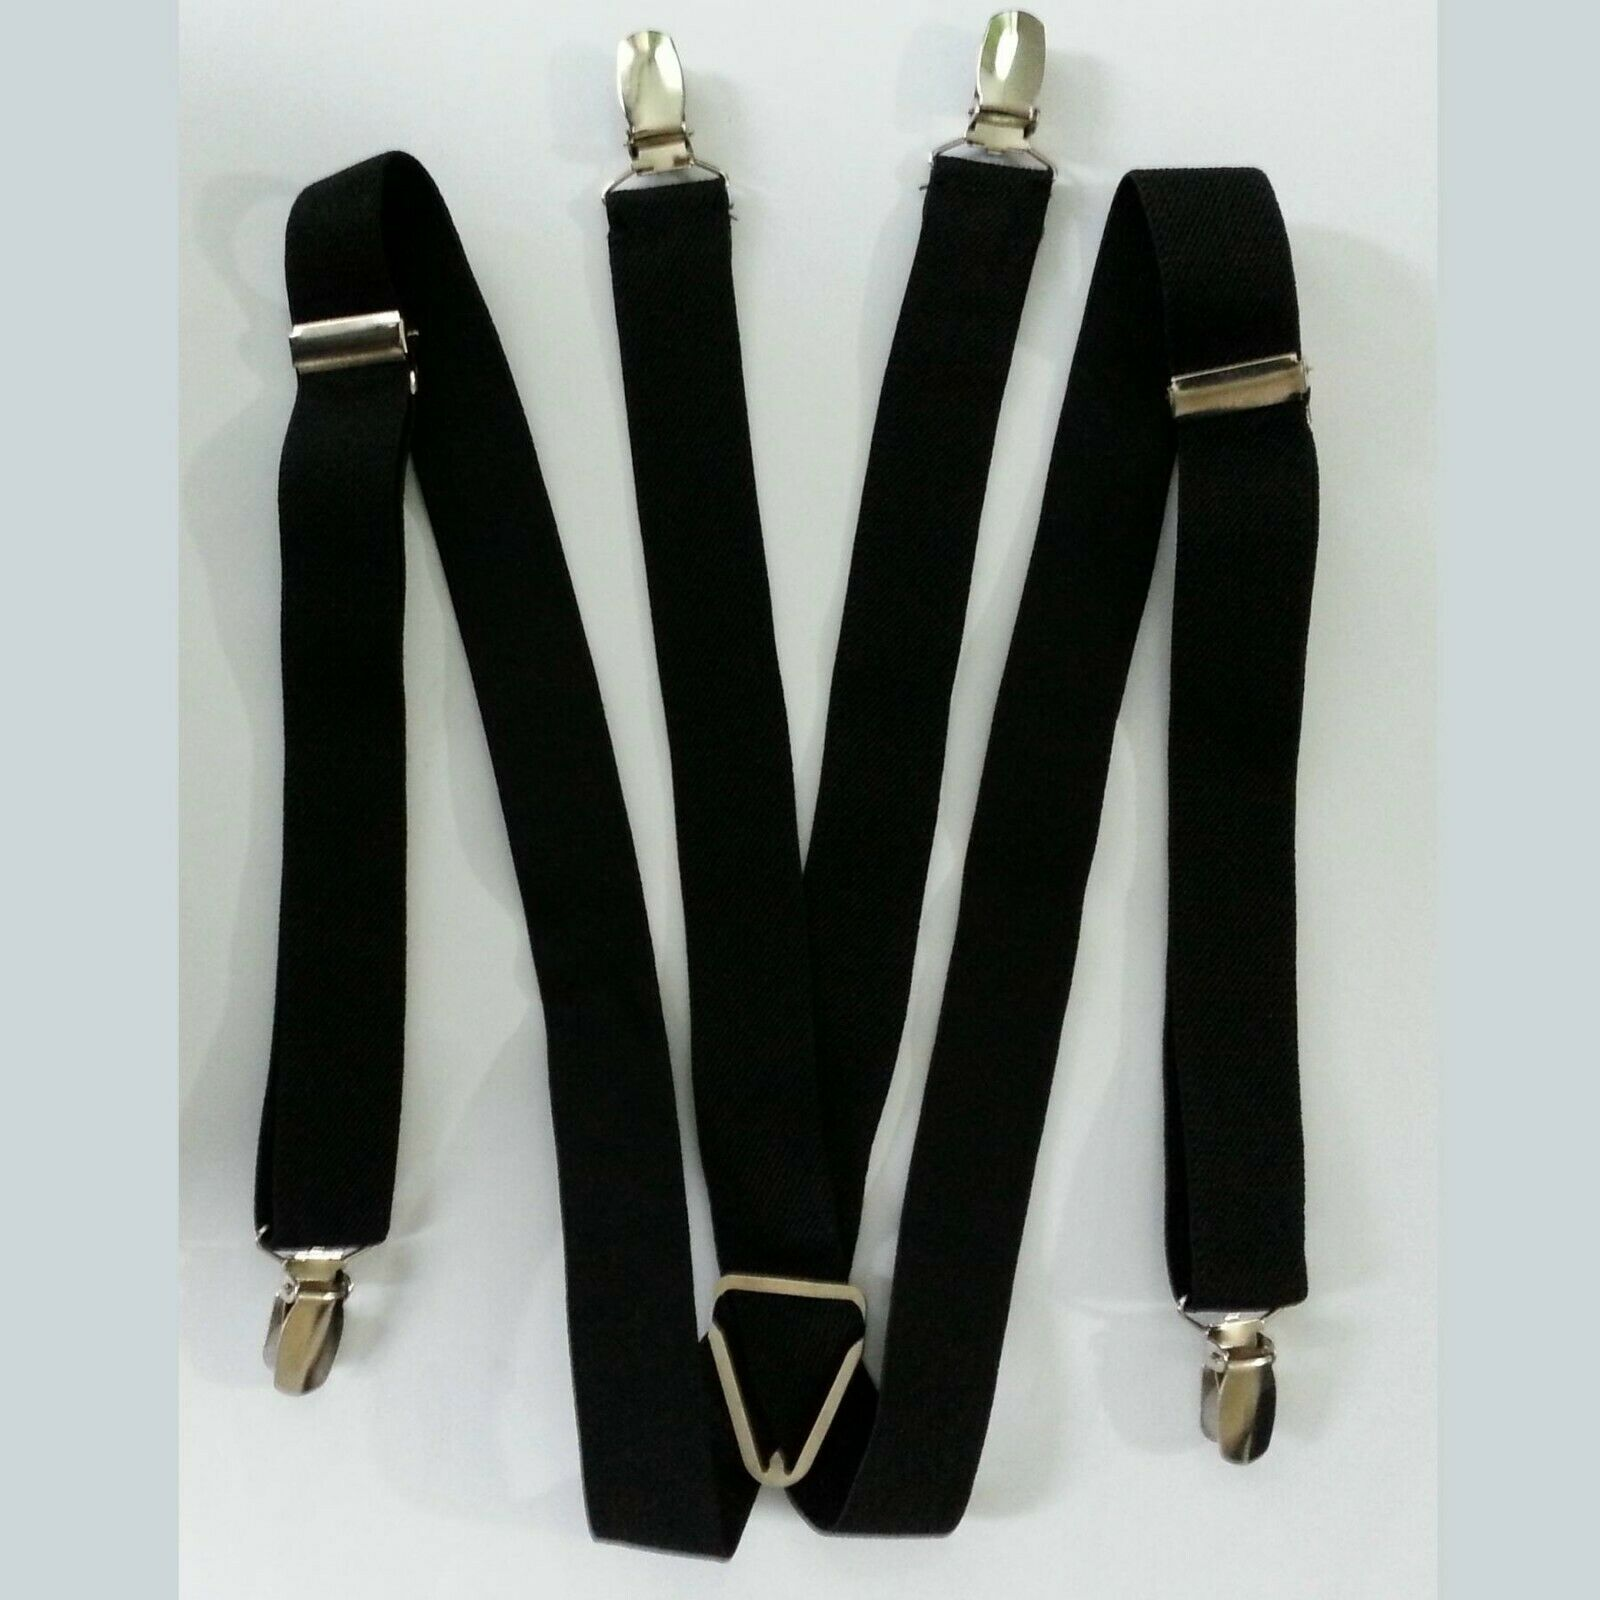 Damen Herren Hosenträger Hose Gürtel Schwarz 4 Clip Clips Träger X-Form Jeans